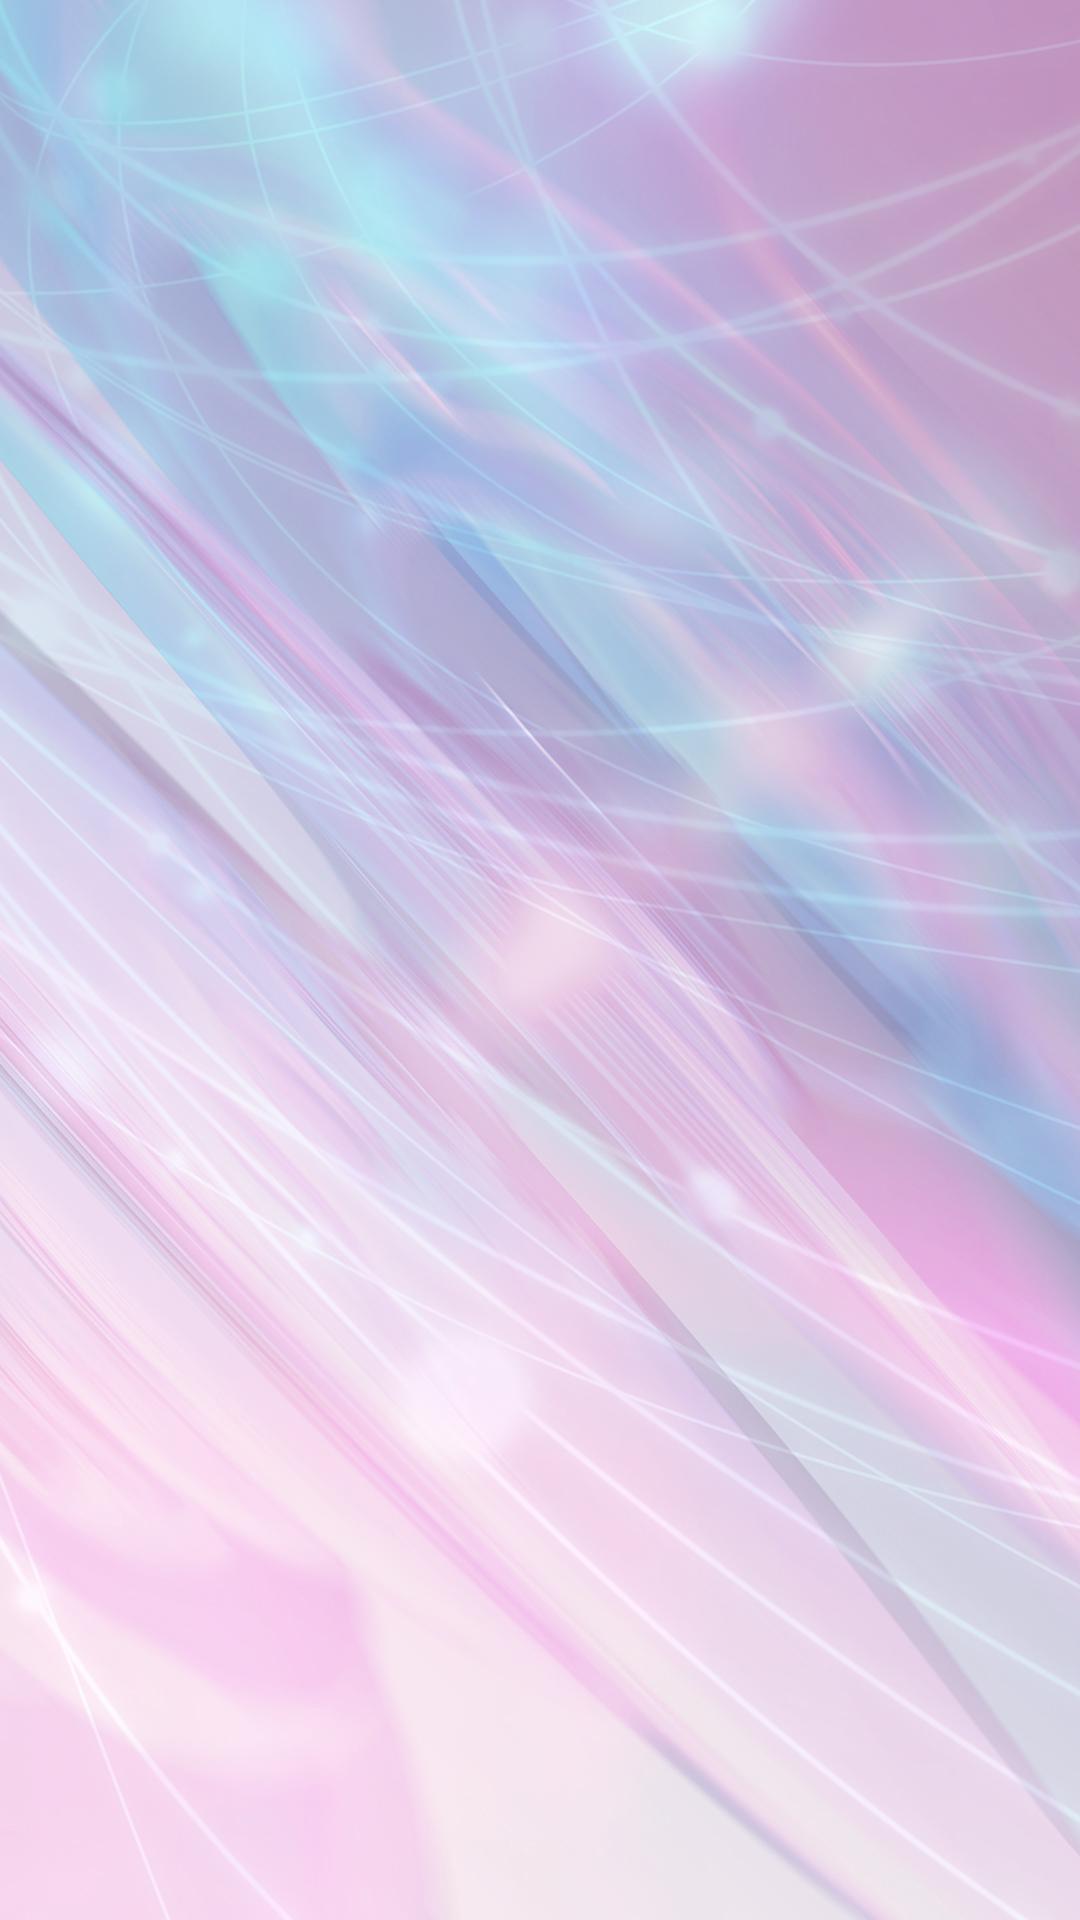 Wallpaper Keren 3d Hd Android Gradasi Warna Peach Biru Wallpaper Sc Android